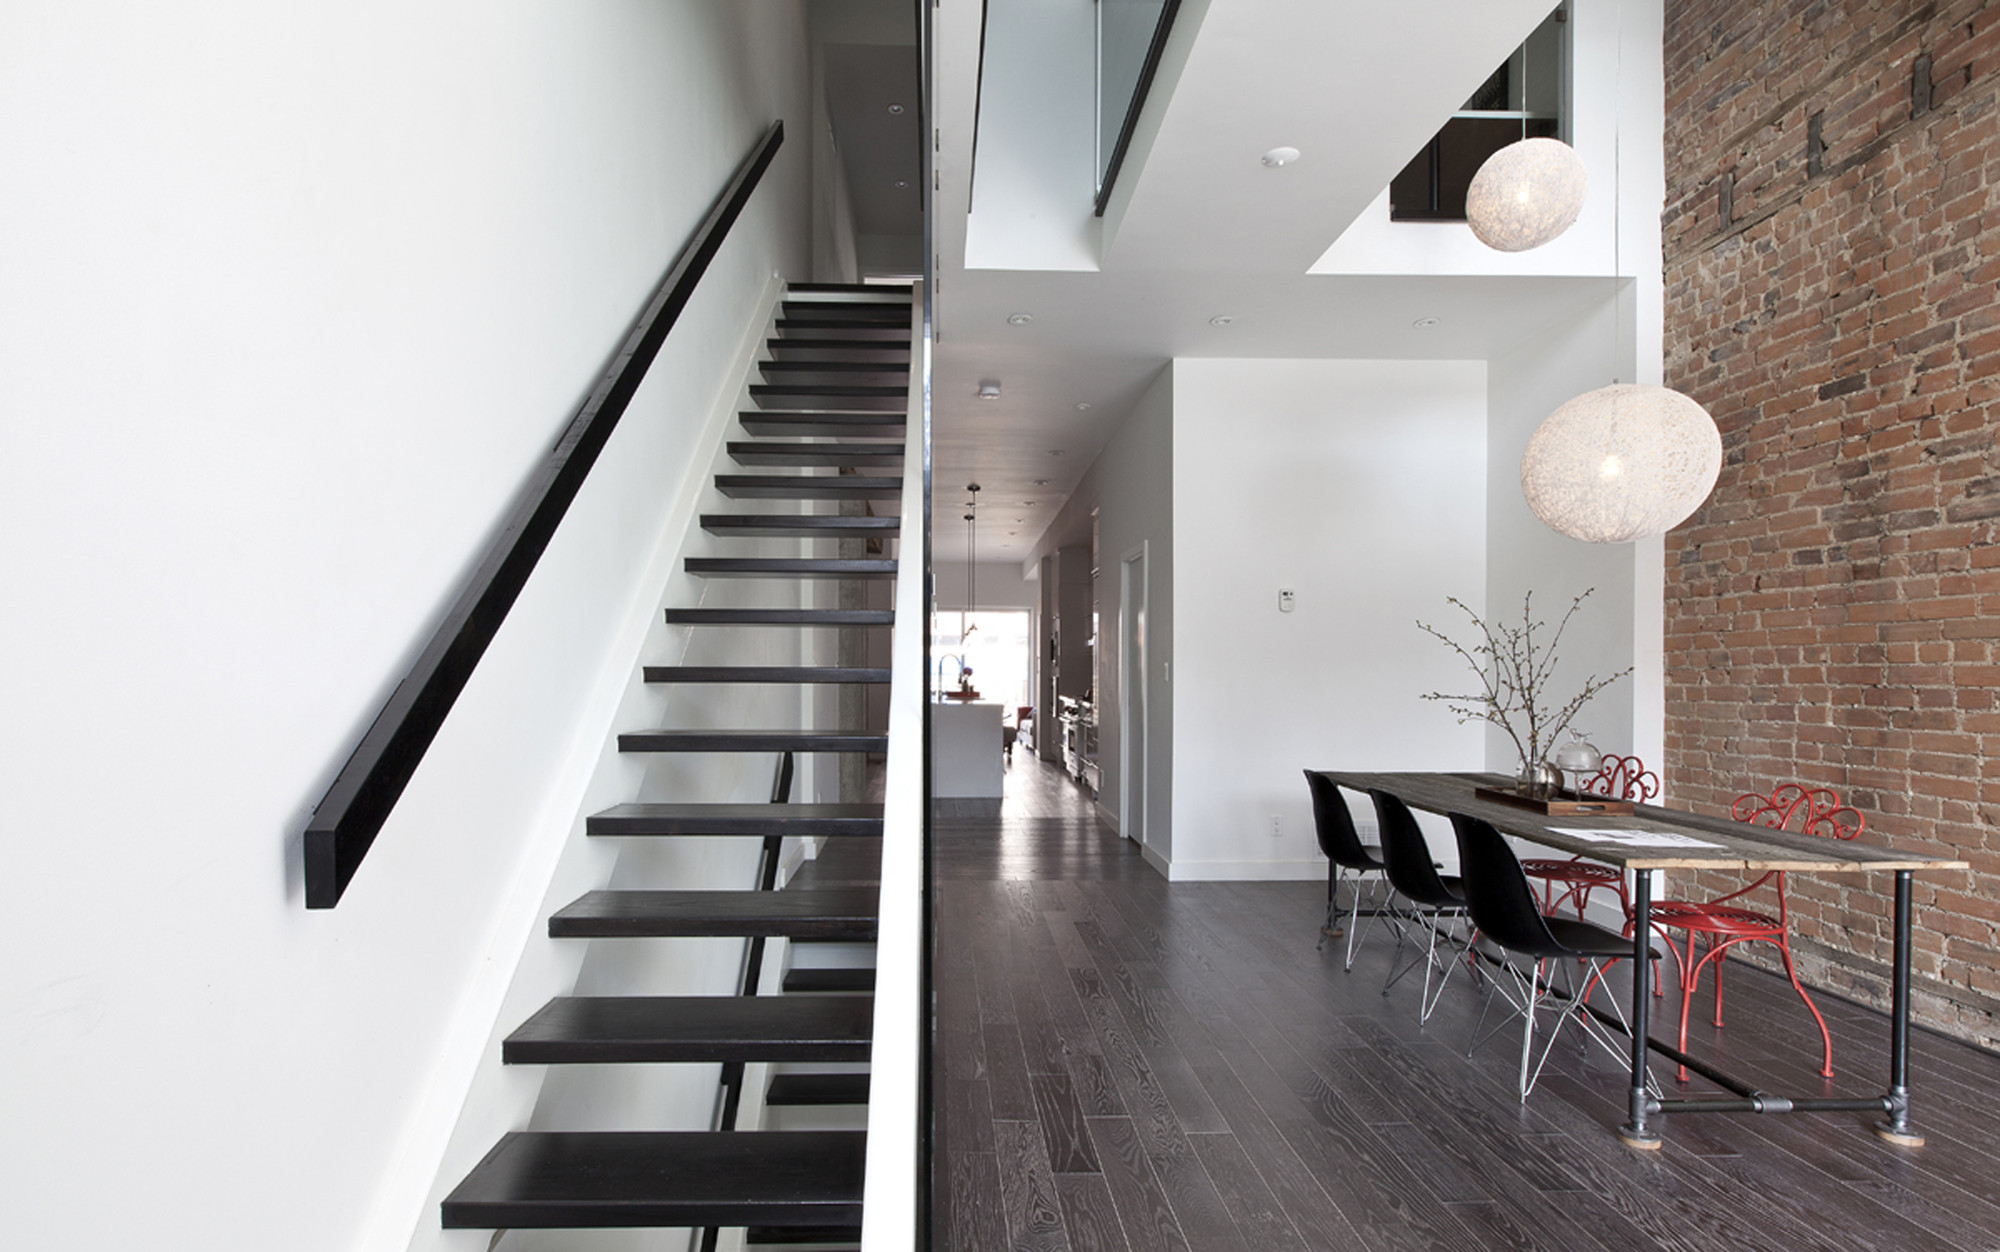 Lady Peel House / rzlbd, © borXu Design